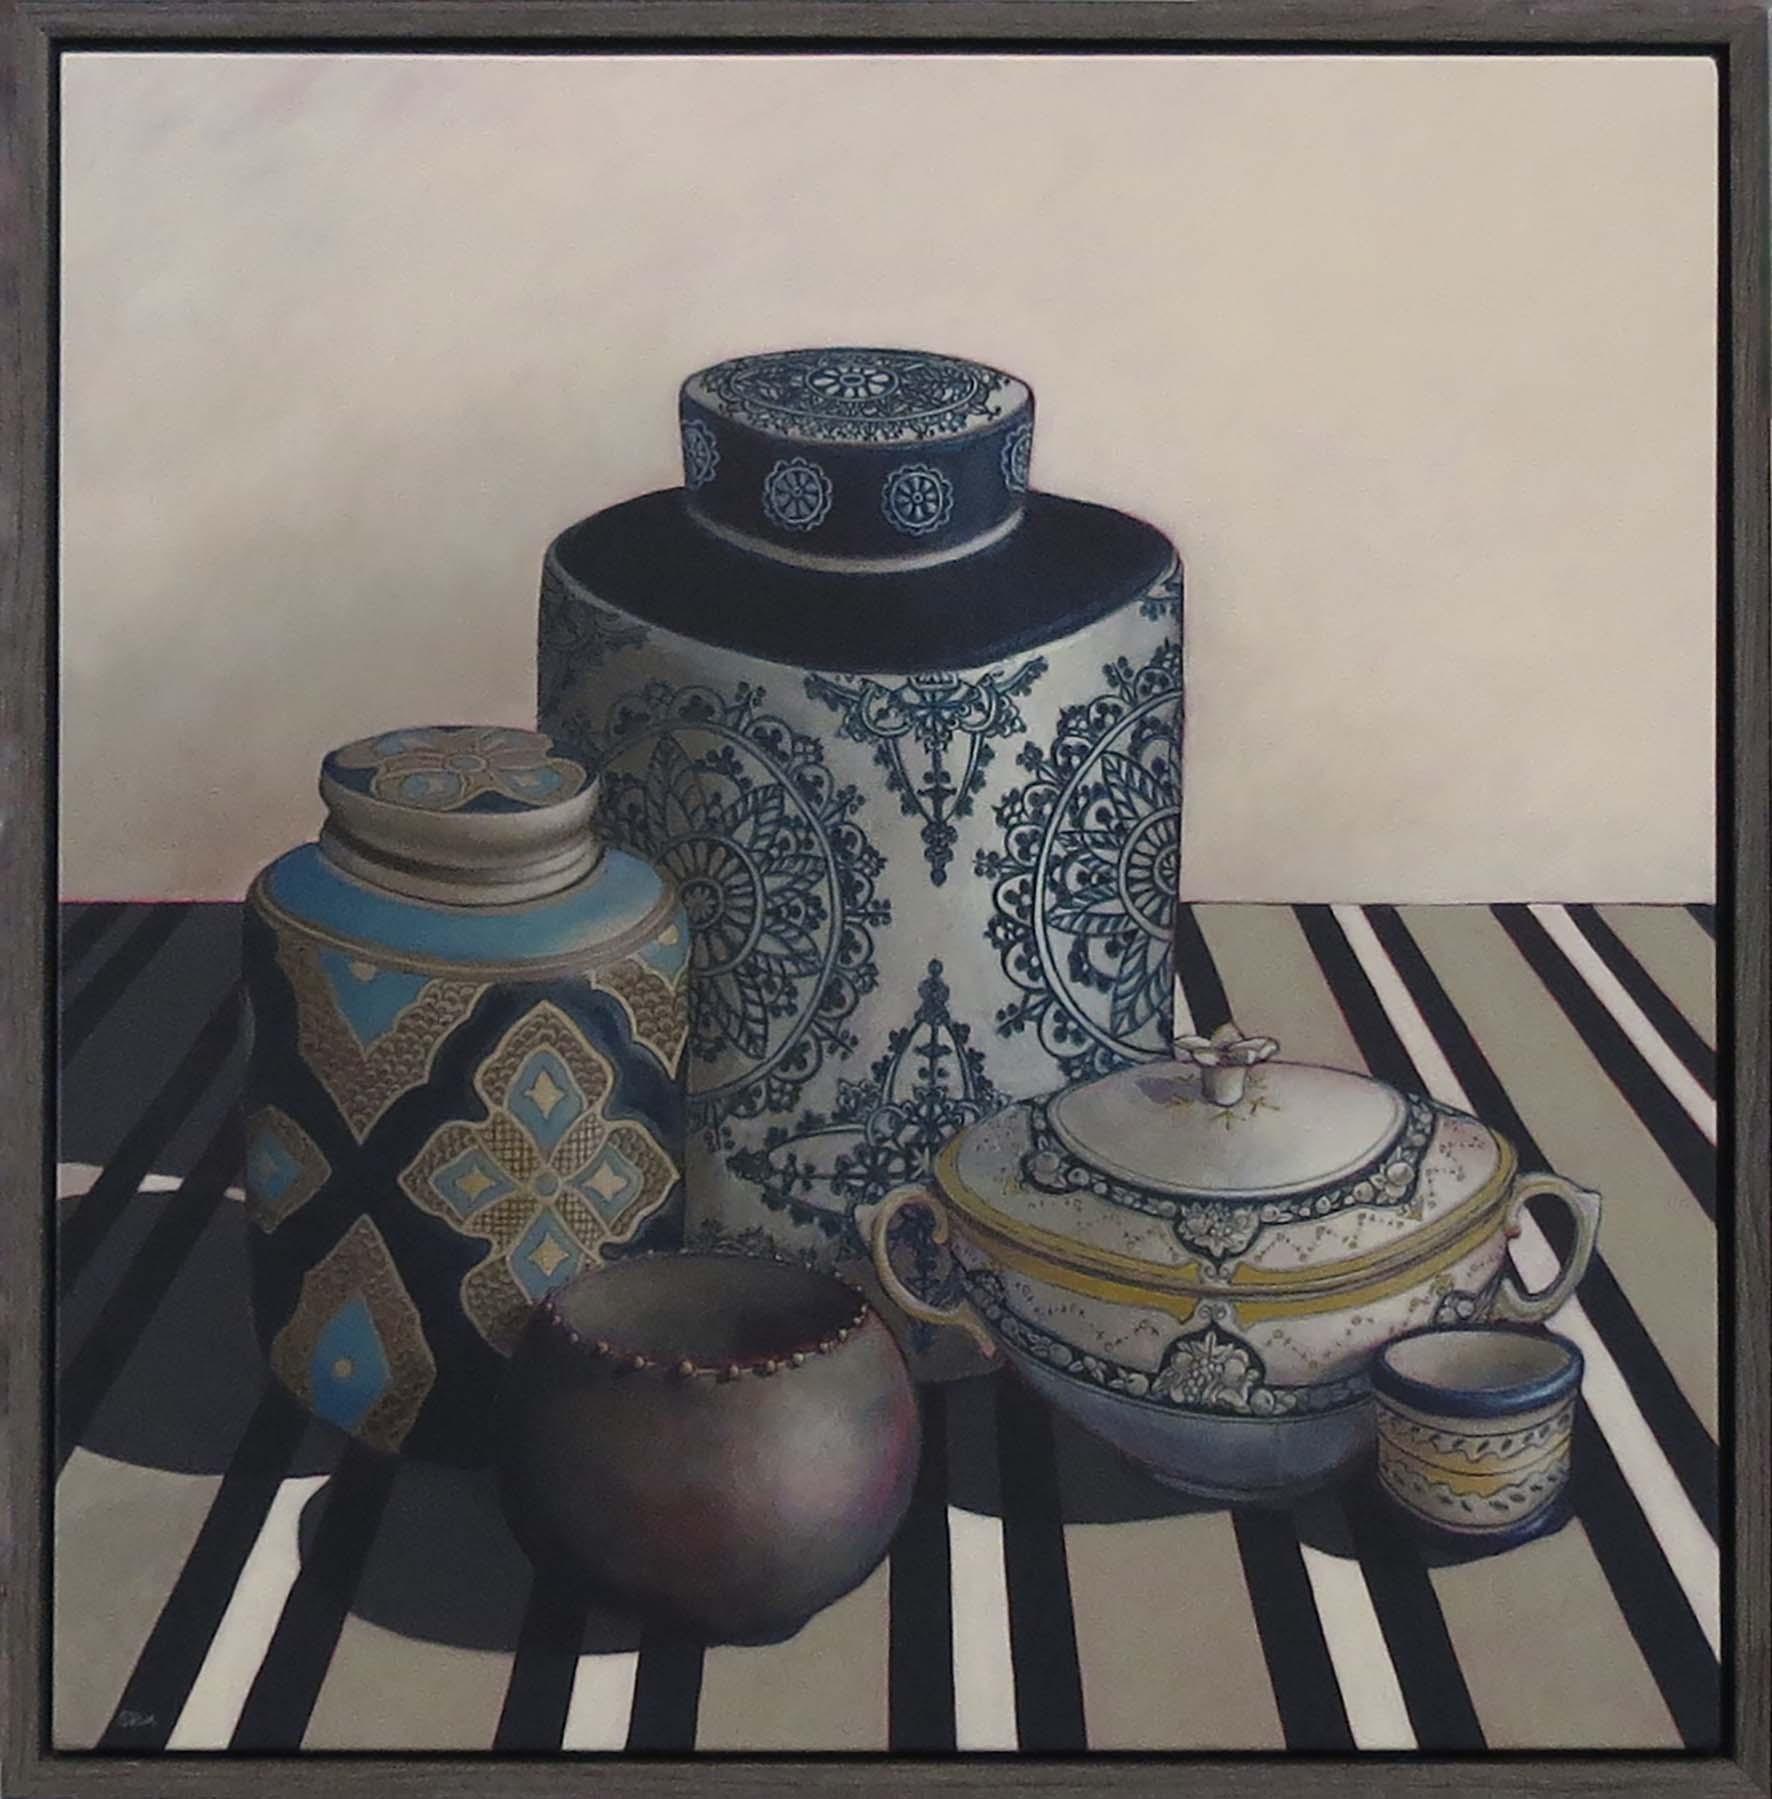 12. Sue Eva, 'Where Our Story Begins', 2018, Acrylic on canvas, 76 x 76cm, $1,195